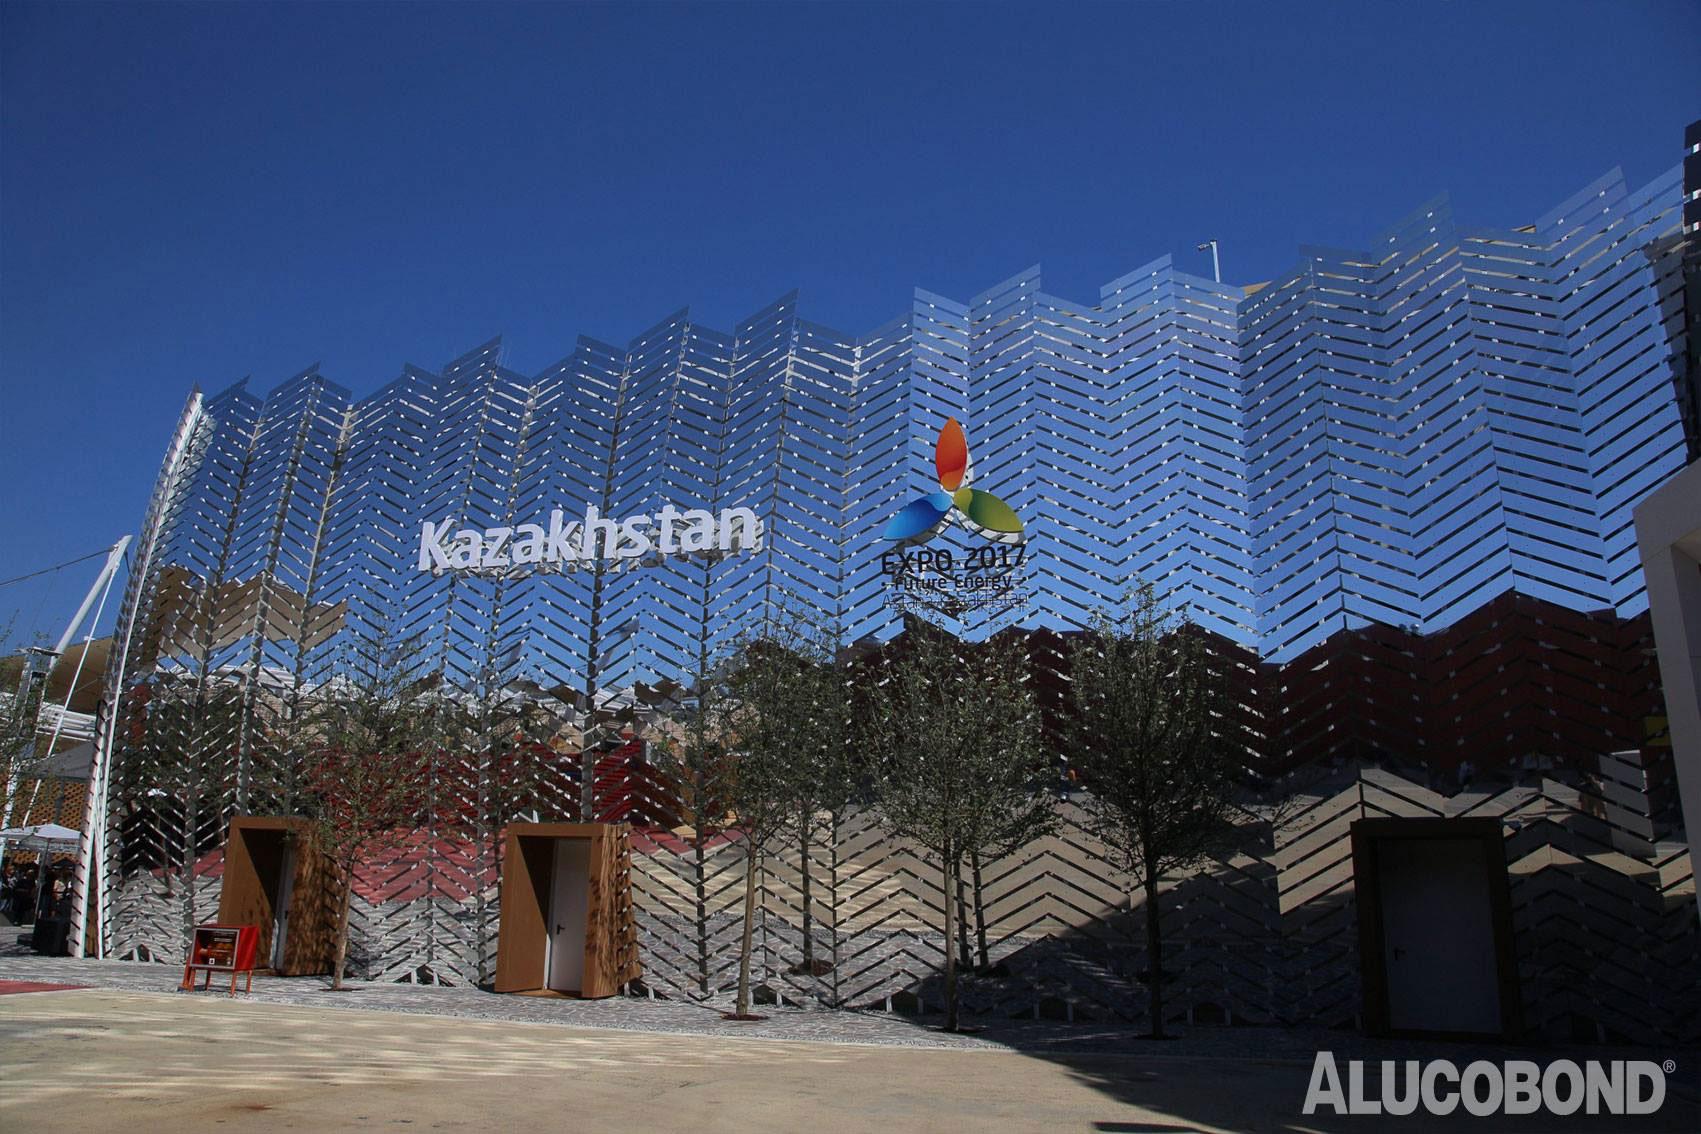 Milano Expo 2015, Kazakhstan Kazakh Pavilion, Alucobond NaturAL Reflect